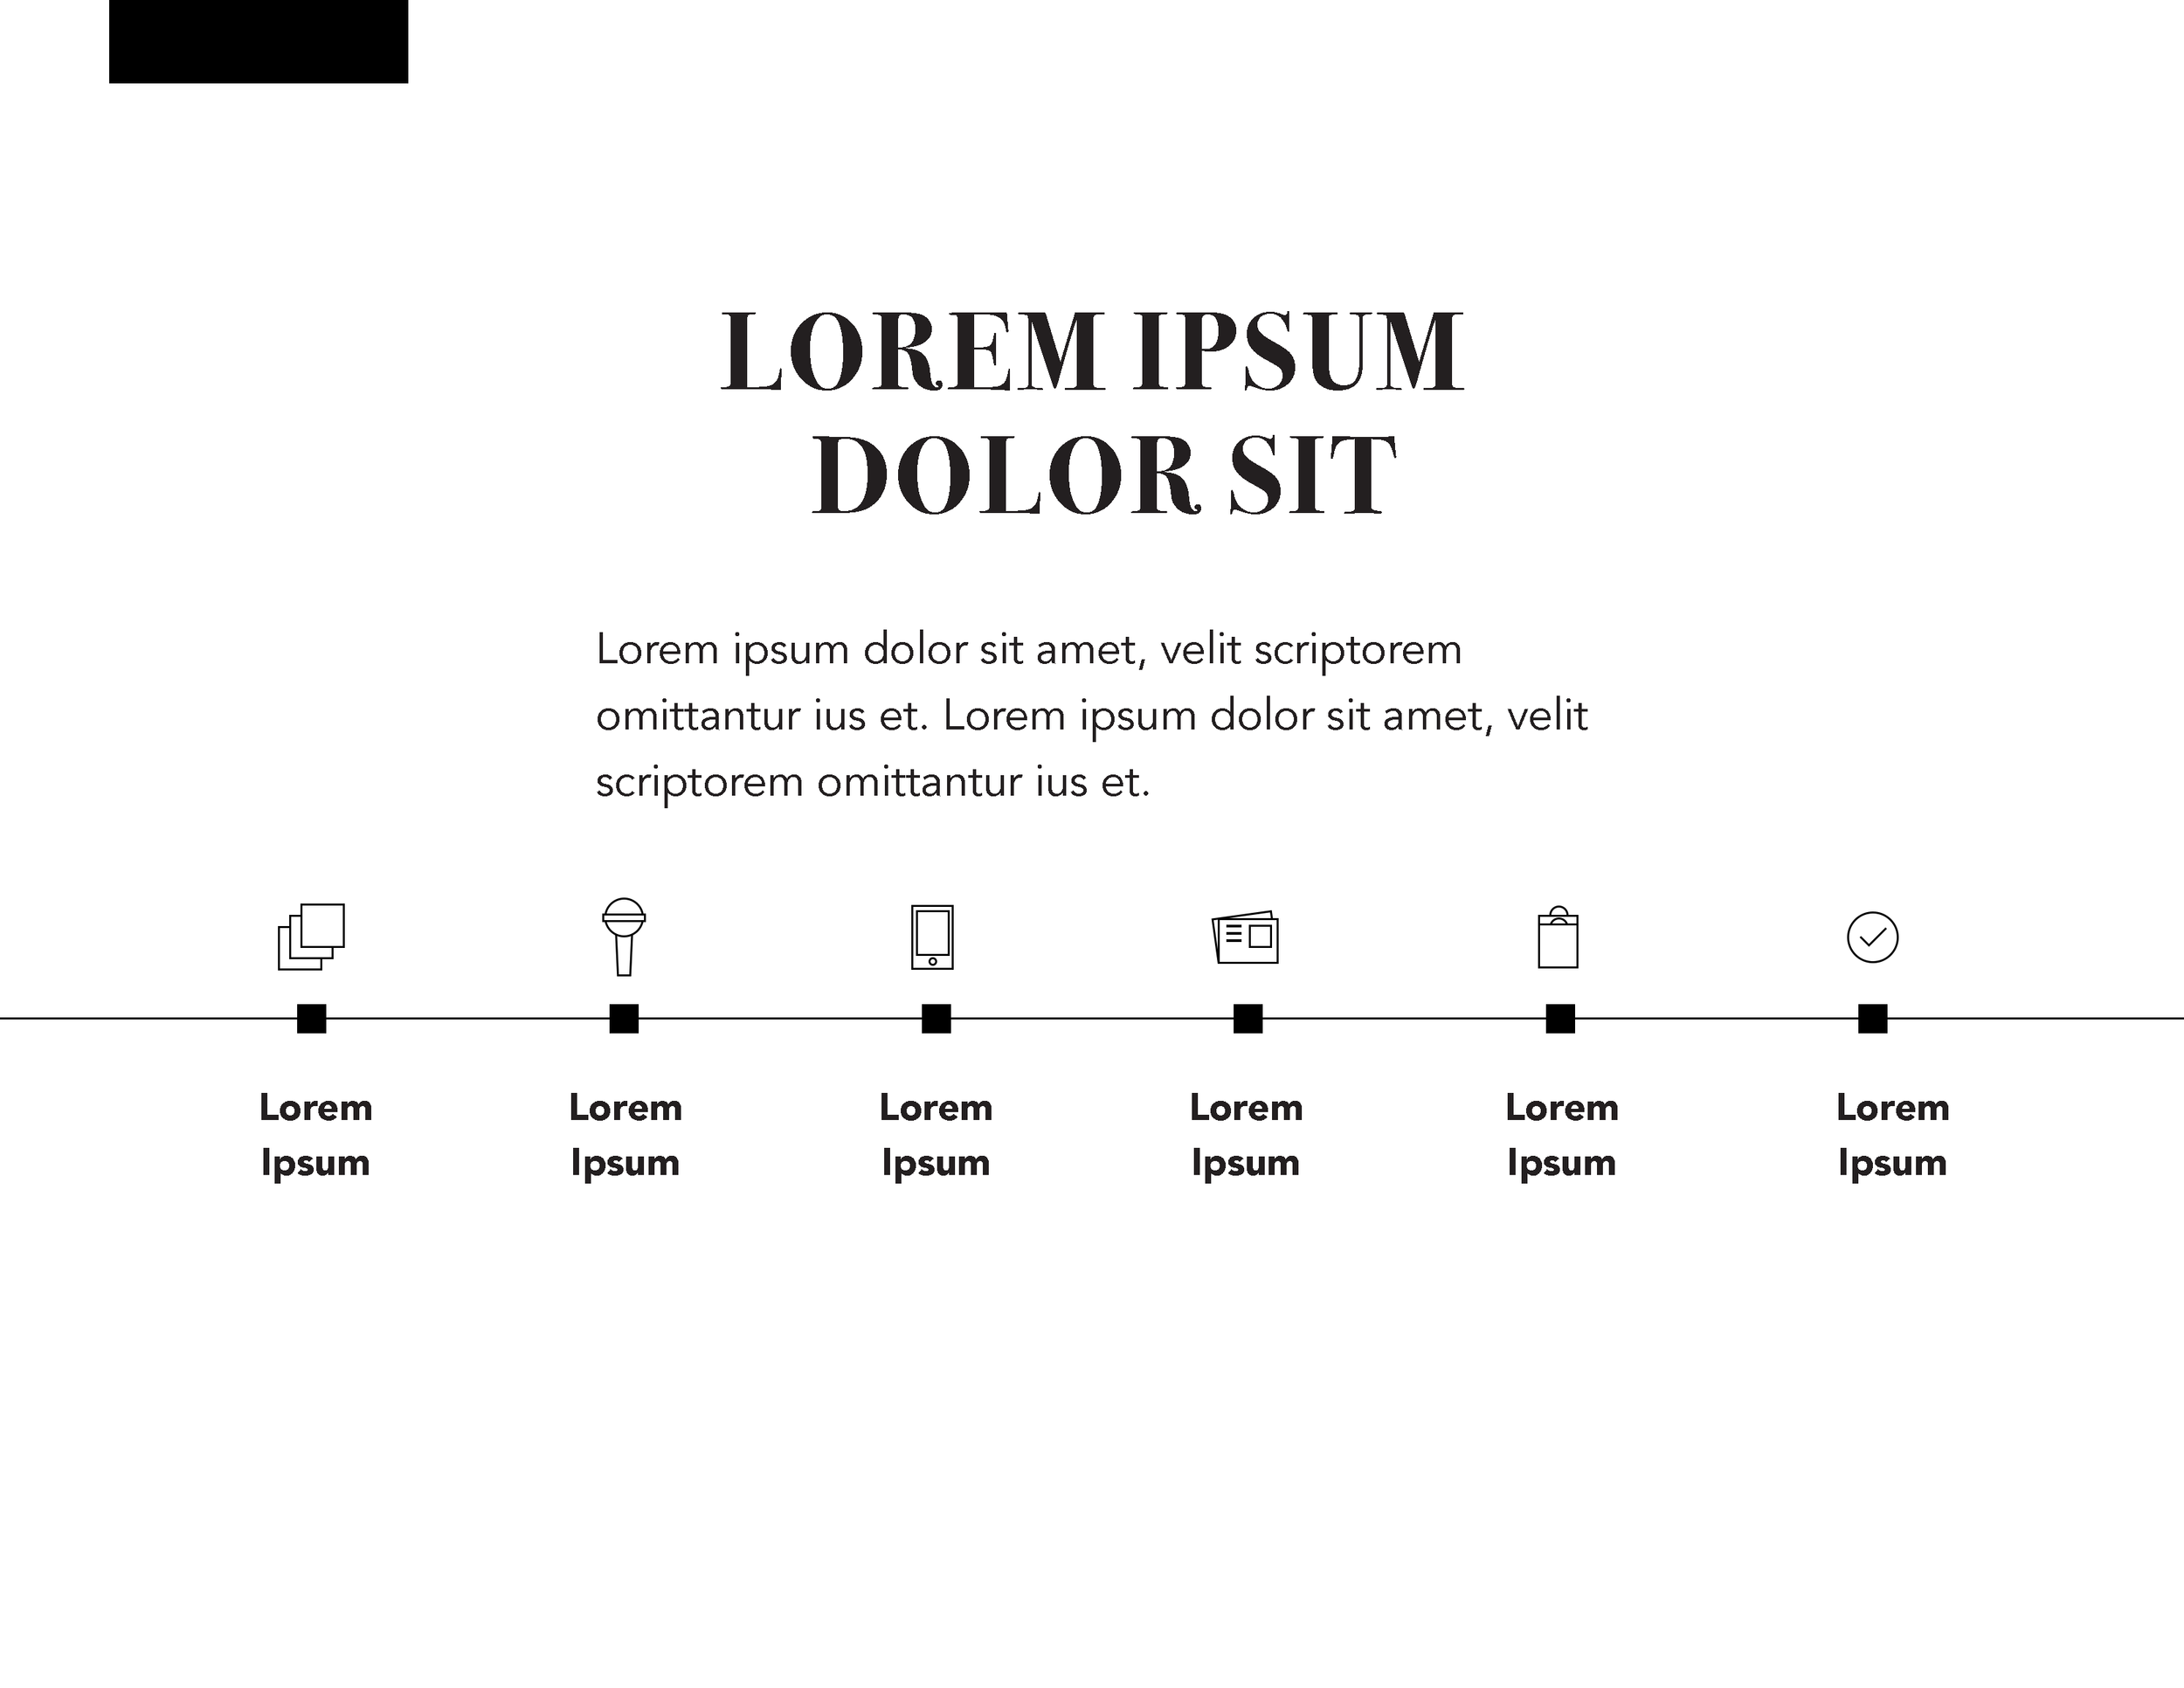 Miquela Deck_LoremIpsum_Page_05.png